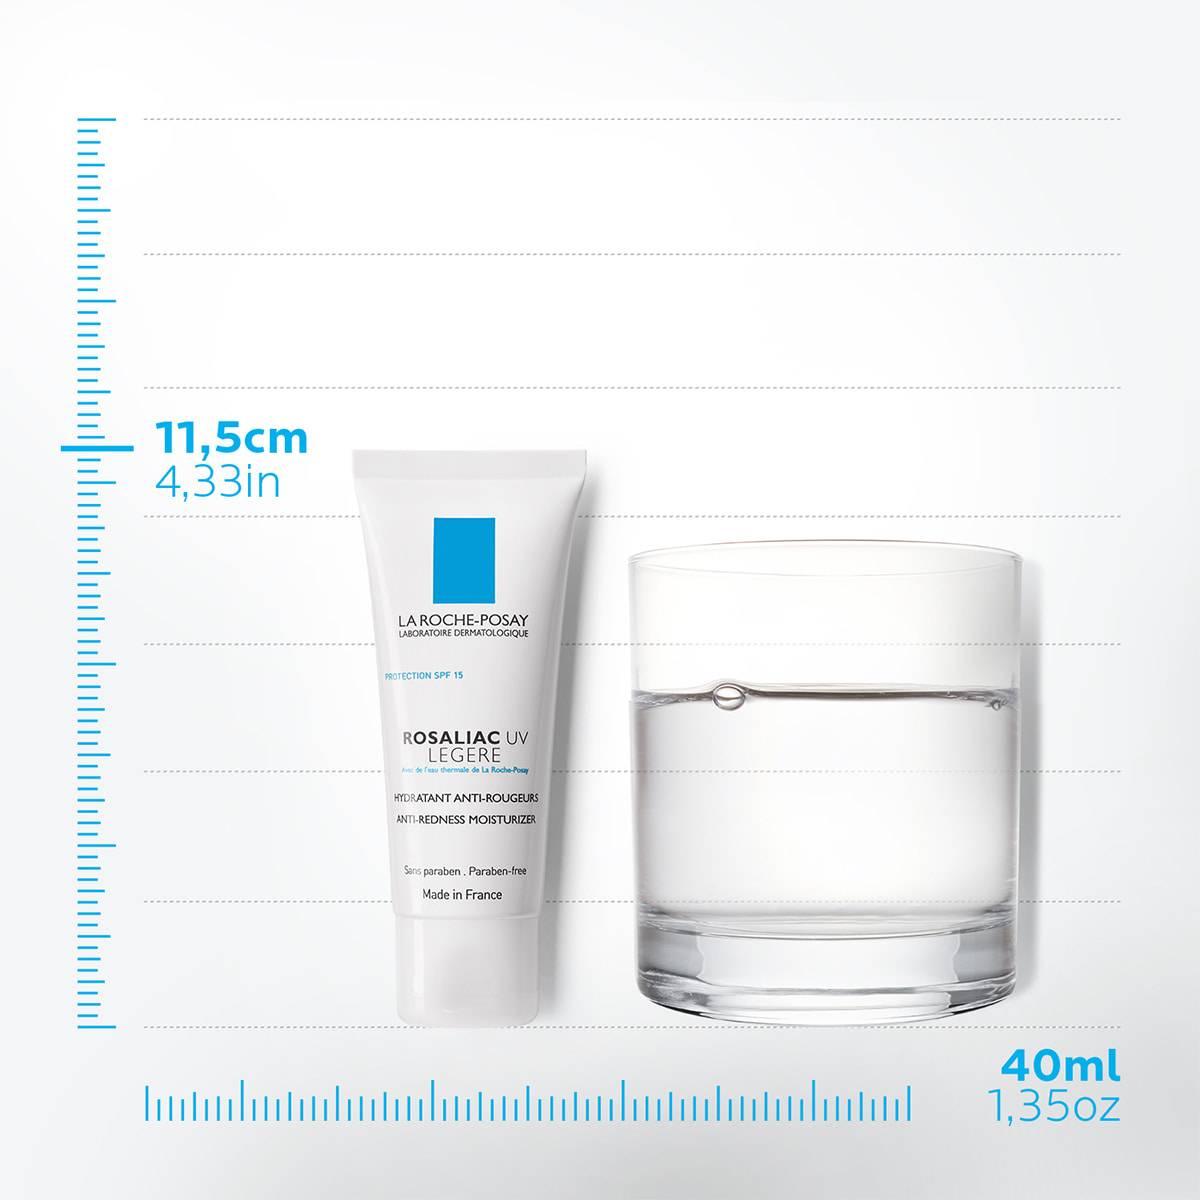 La Roche Posay ProduktSide Ansigtspleje Rosaliac UV Let Spf15 40ml 3337